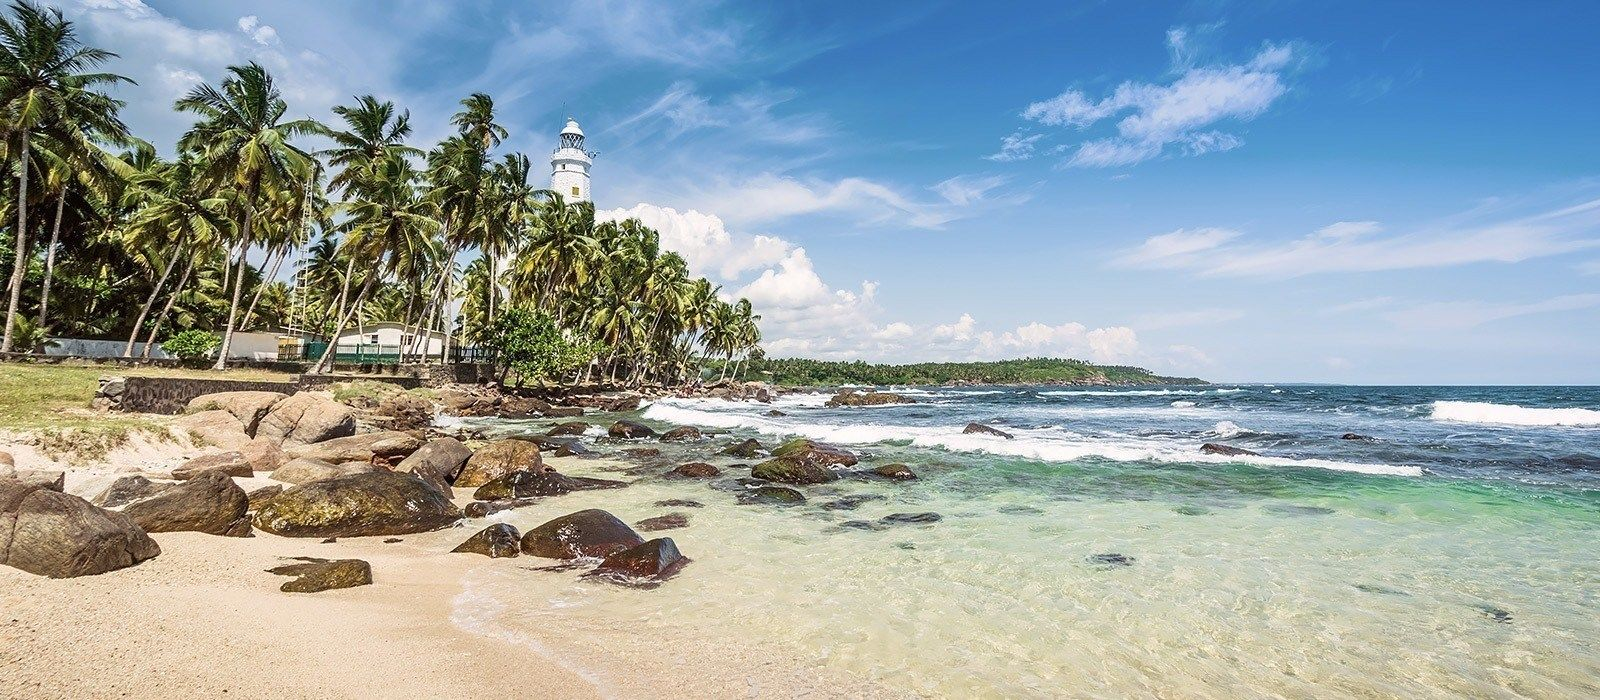 Sri Lankan Heritage and Maldives Luxury Tour Trip 5